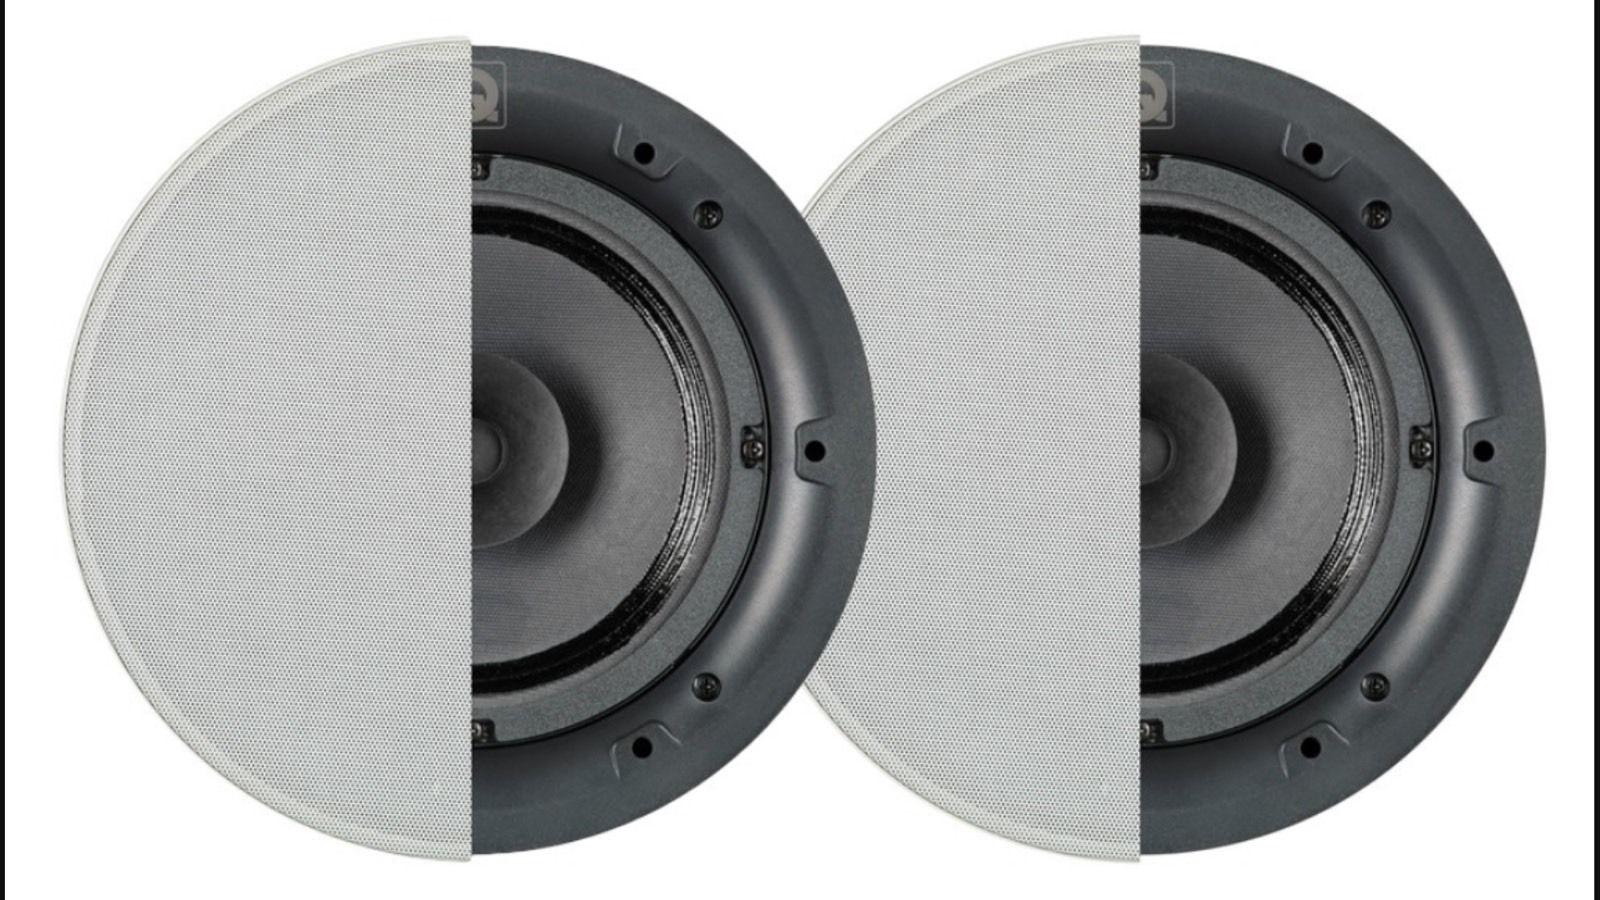 Sonos Compatible Ceiling Speakers